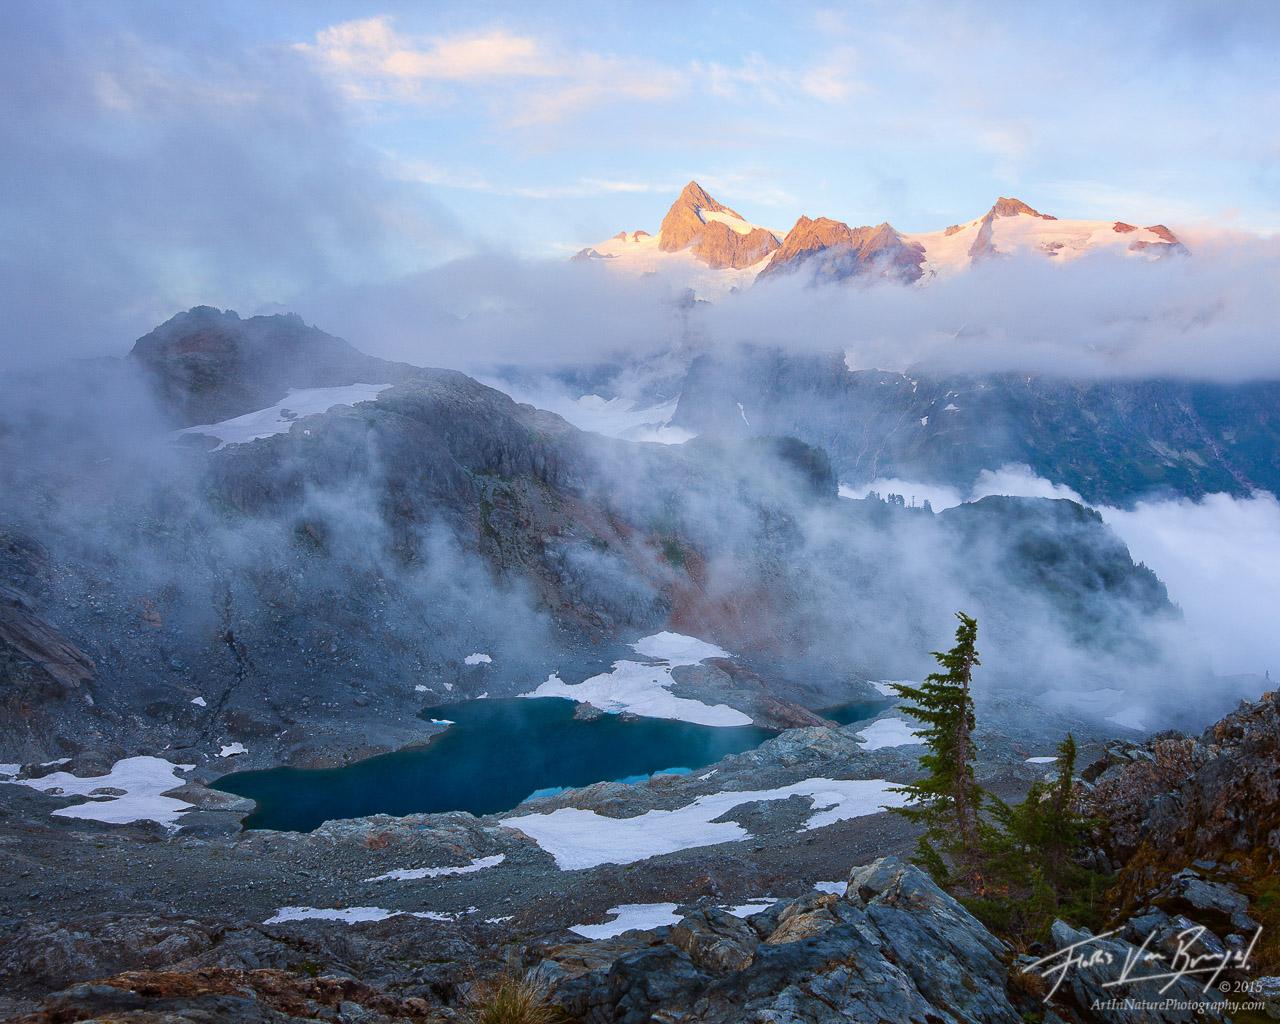 Mt Shuksan, North Cascades, Swirling Mists, photo